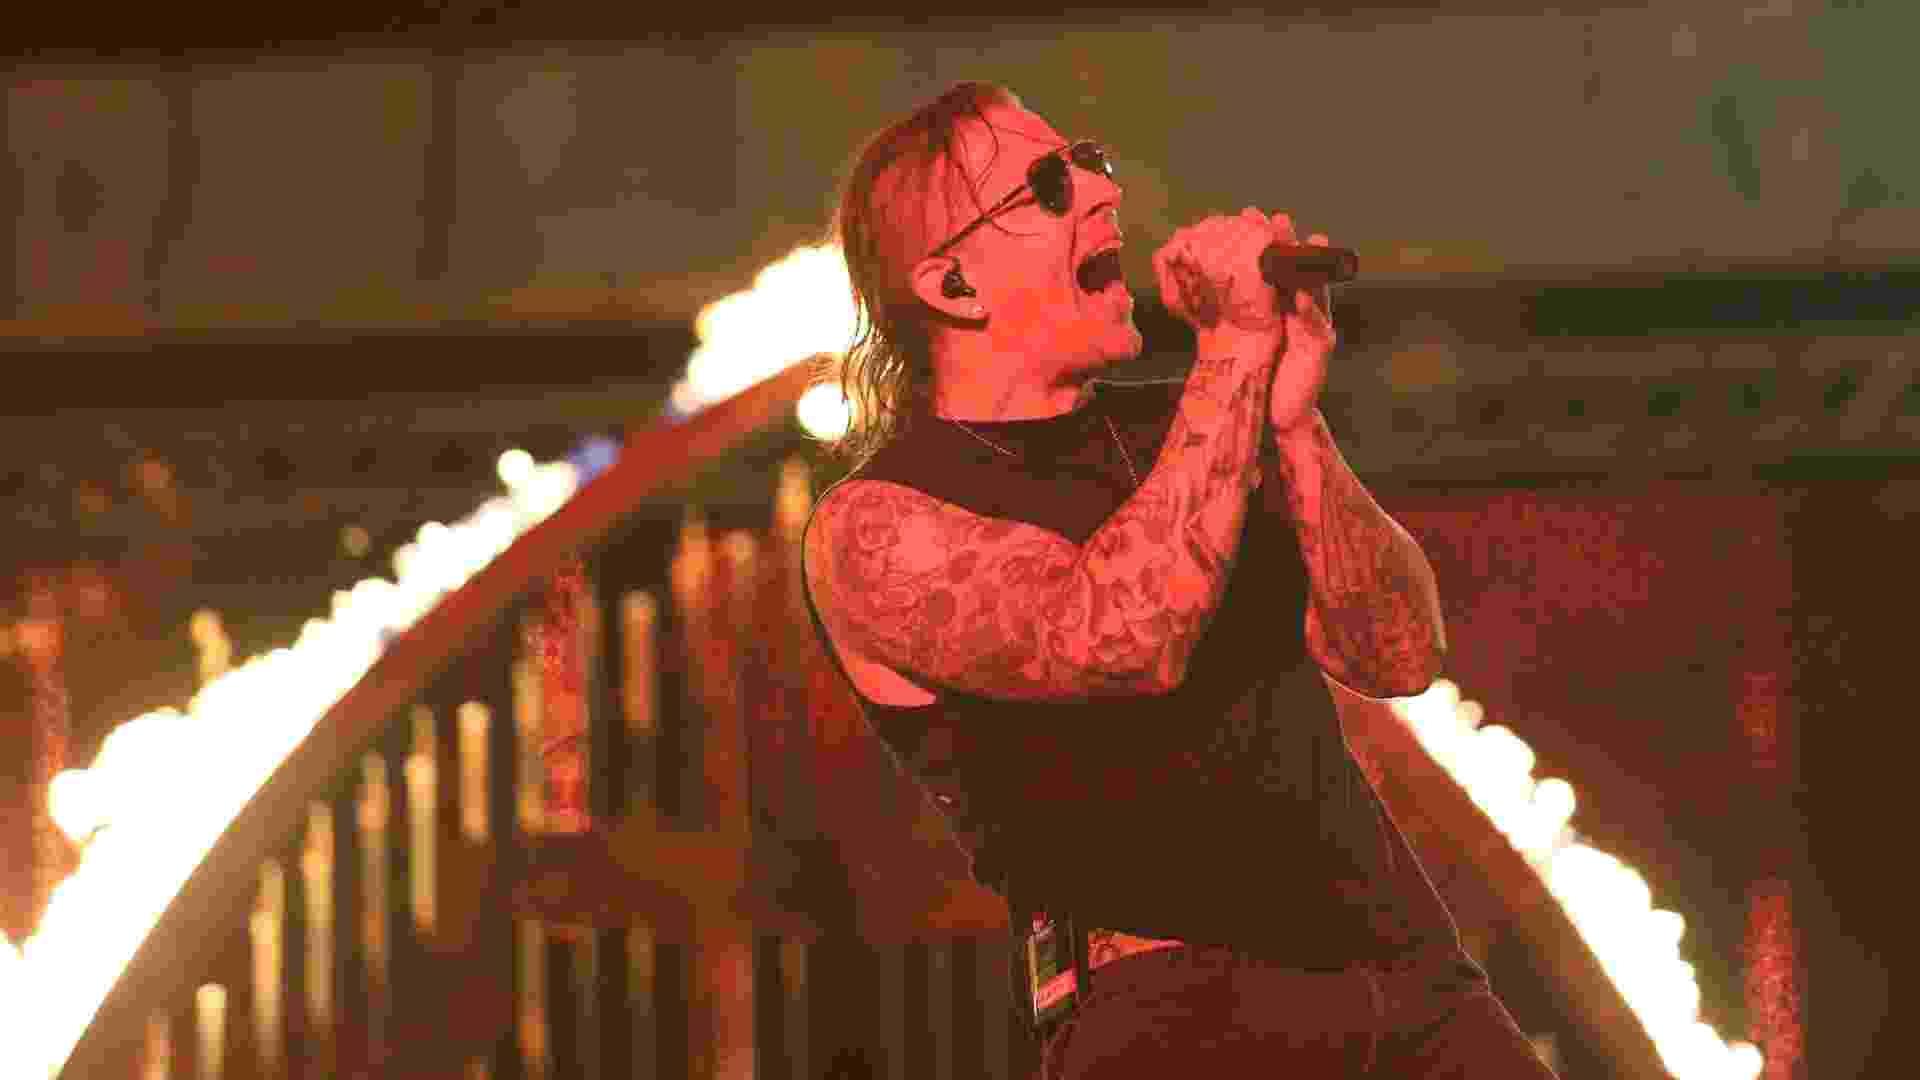 22.set.2013 - Avenged Sevenfold faz o penúltimo show do Rock in Rio 2013 no Palco Mundo - Marco Antônio Teixeira/UOL